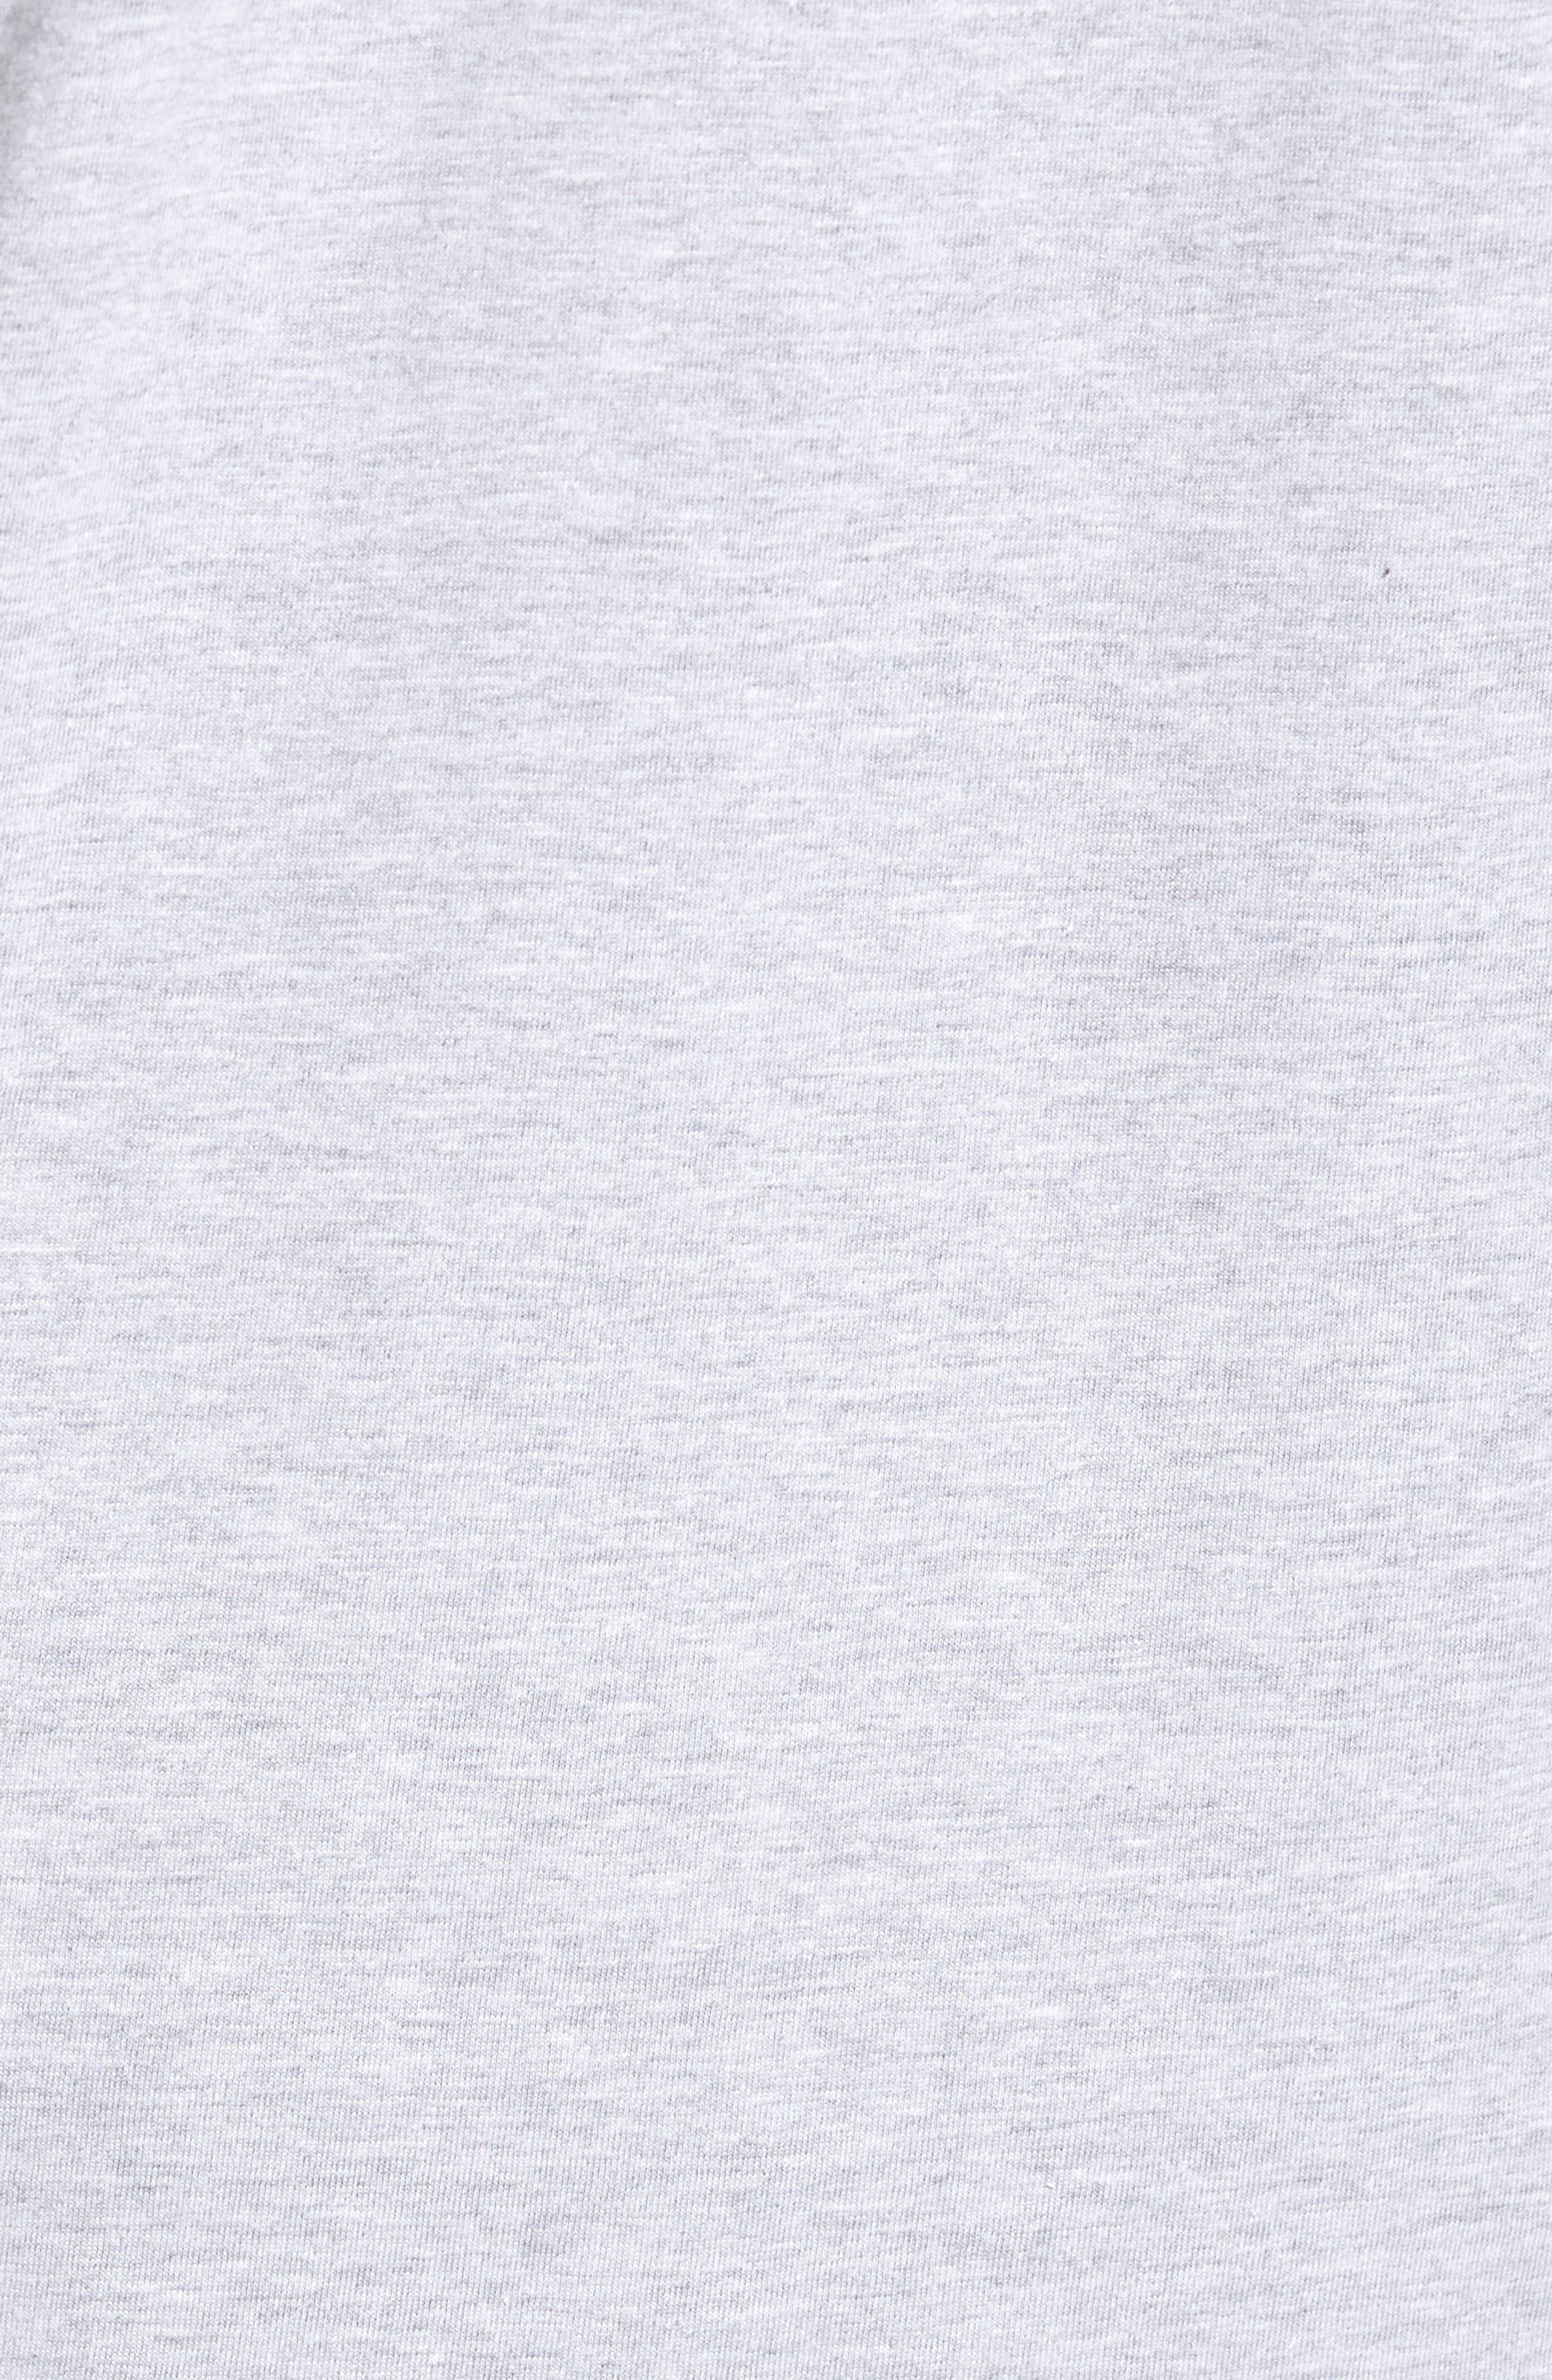 PNW Shield Sweatshirt,                             Alternate thumbnail 5, color,                             Heather Grey